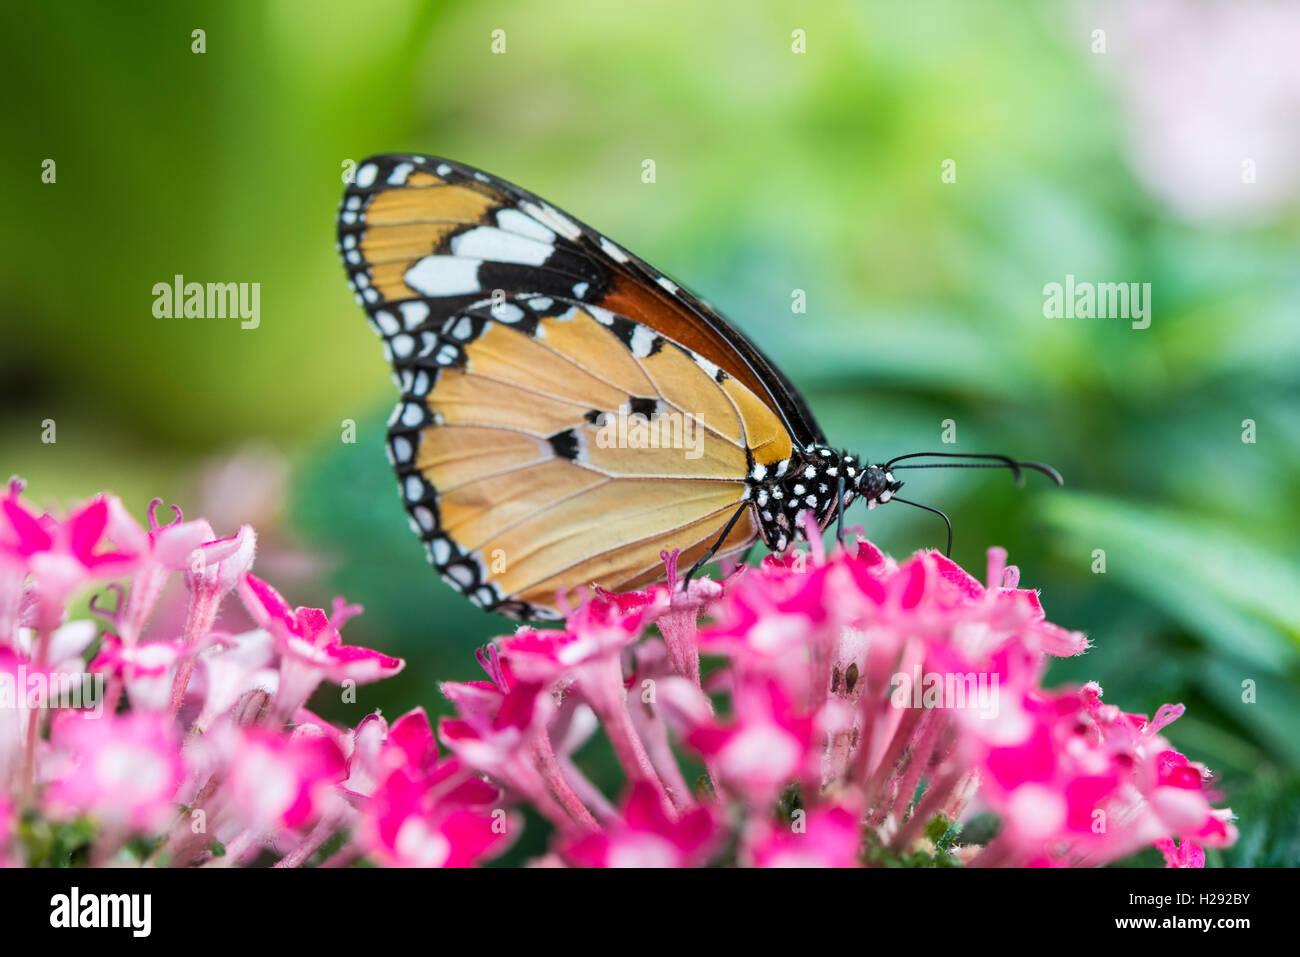 Le monarque (Danaus plexippus) sur fleur rose, captive Photo Stock